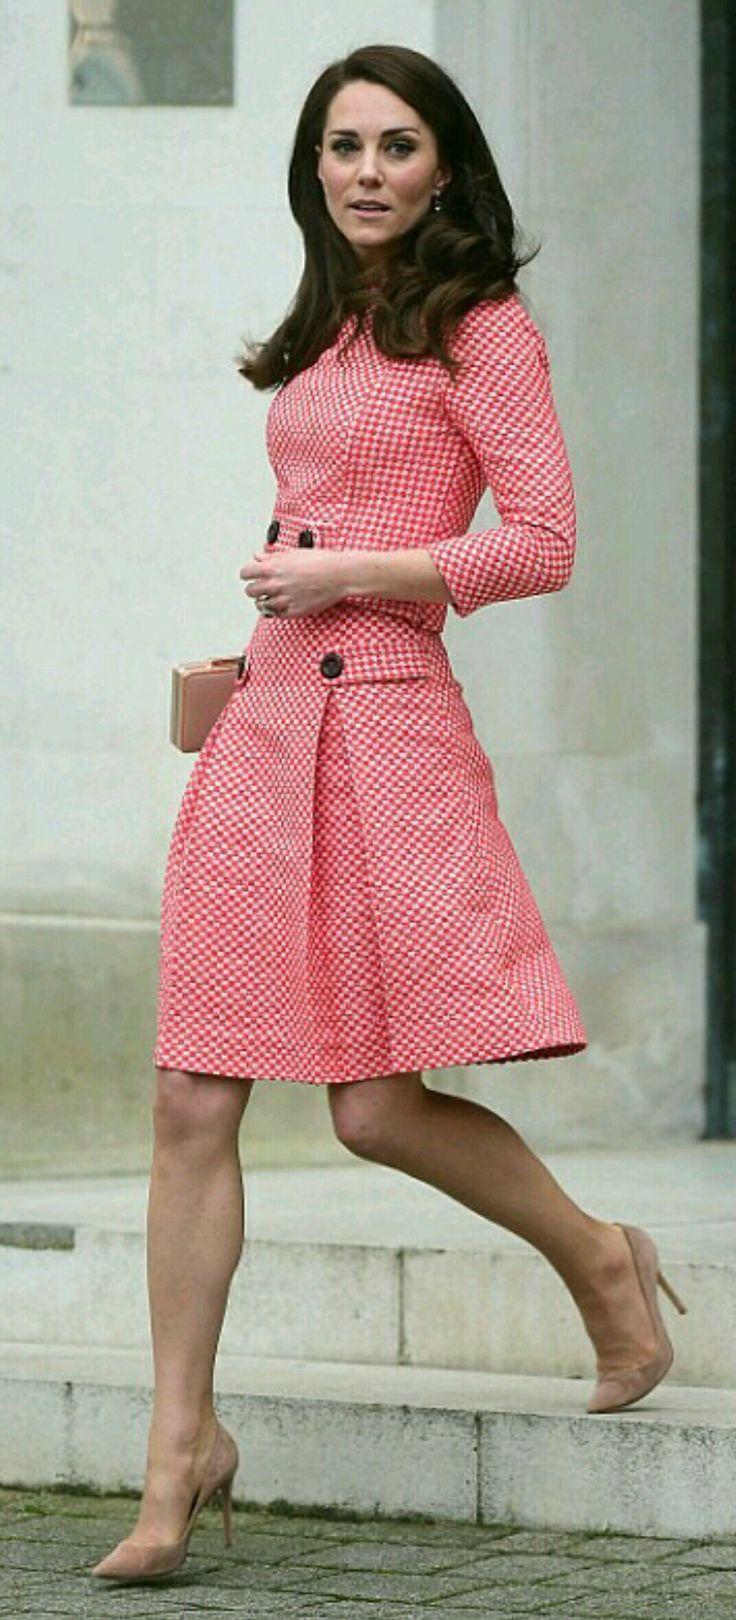 Duchess of Cambridge wearing gingham